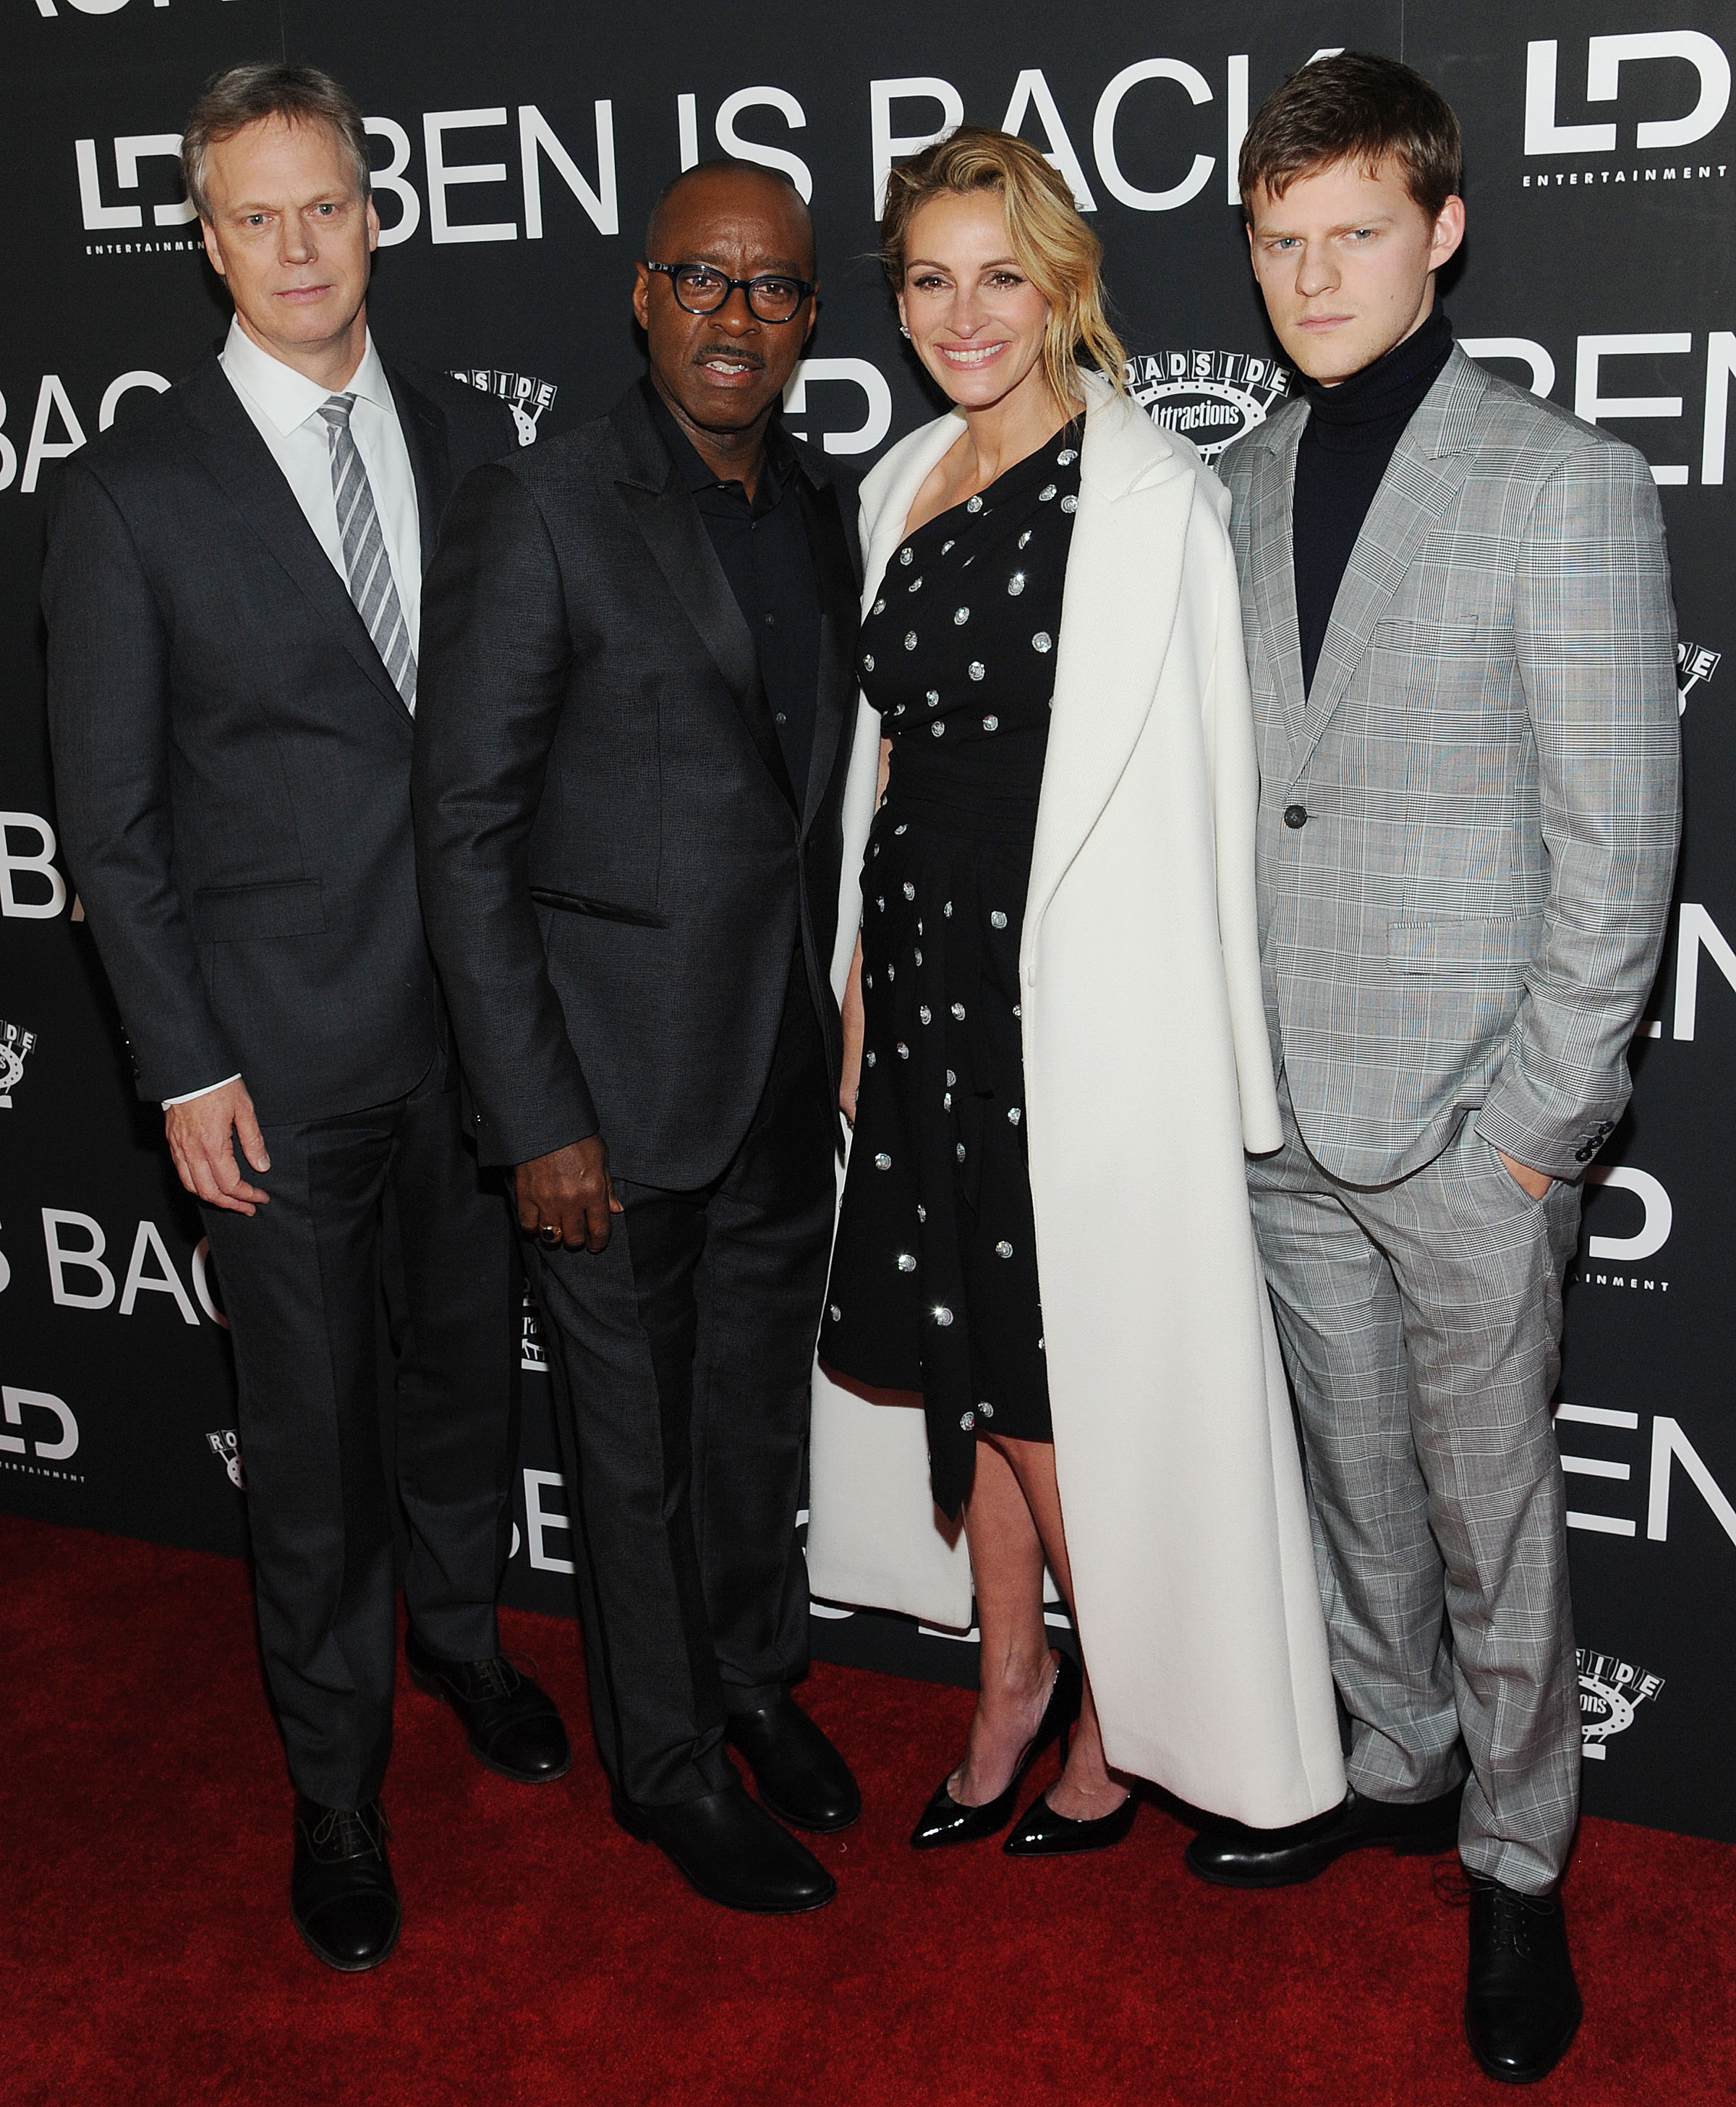 Peter Hedges, Courtney B Vance, Julia Roberts, Lucas Hedges'Ben Is Back' film premiere, Arrivals, New York, USA - 03 Dec 2018Ben Is Back New York Premiere